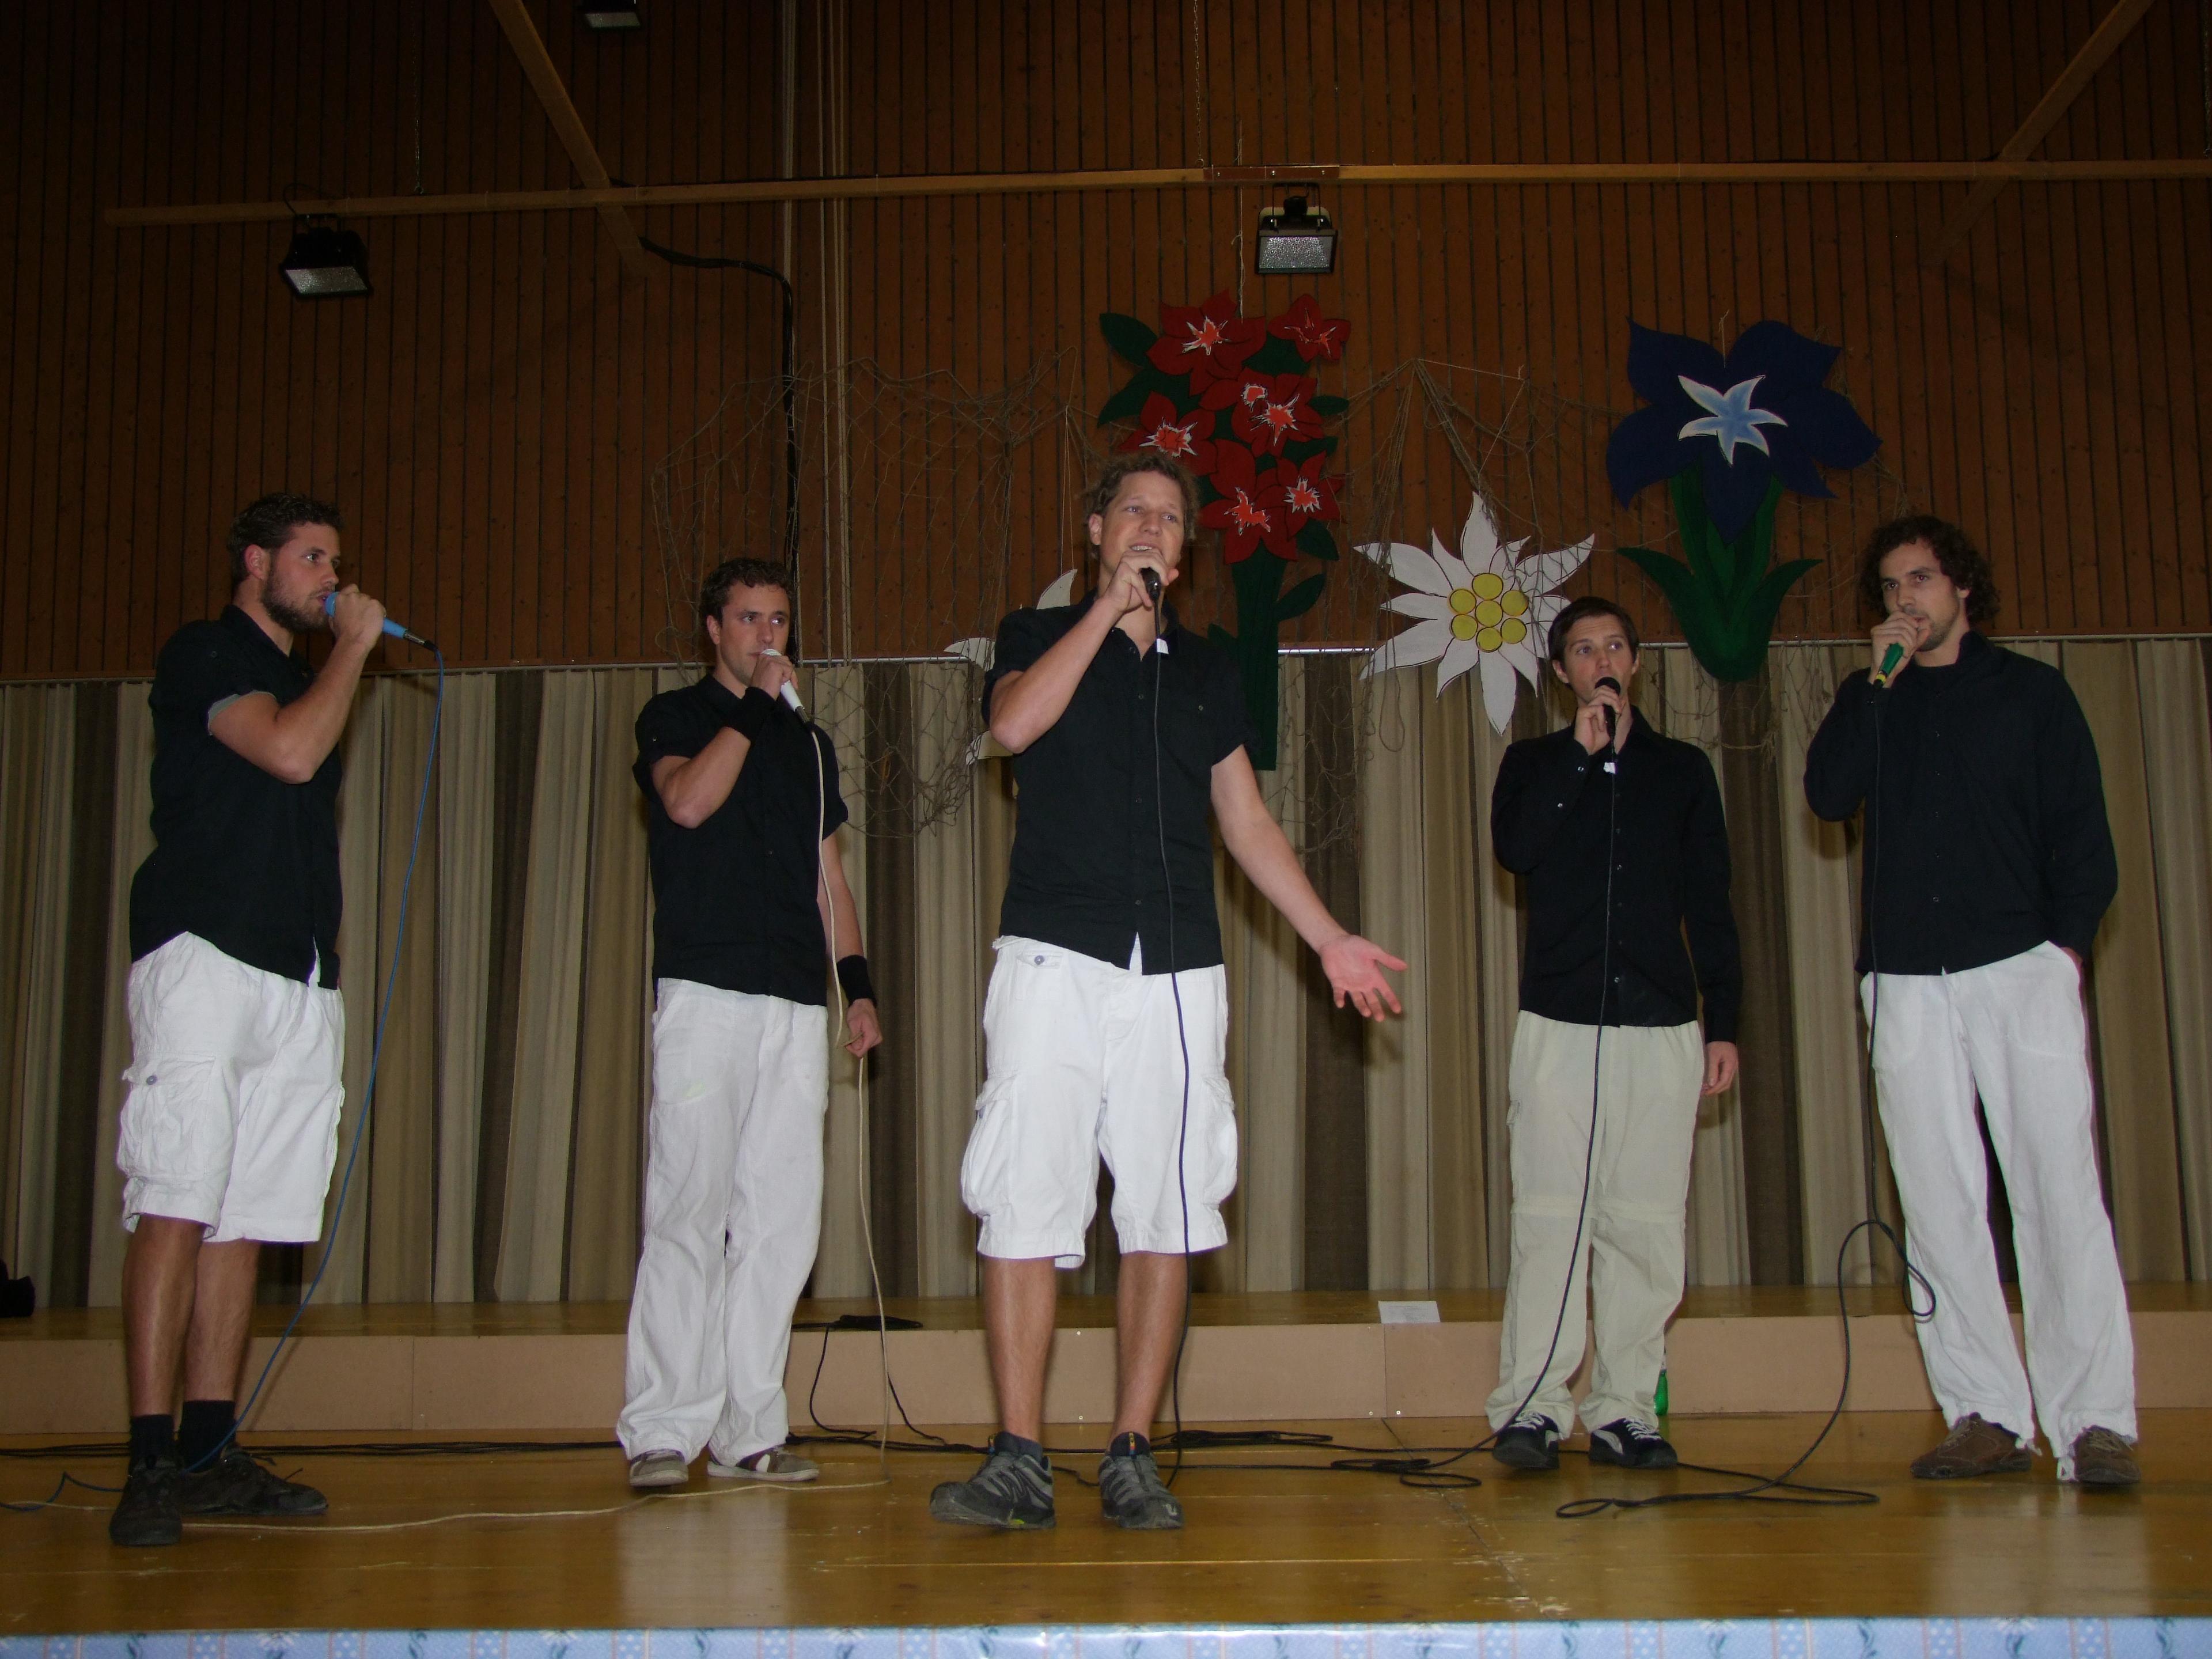 0720-2010-KirchengesangstagBuochs